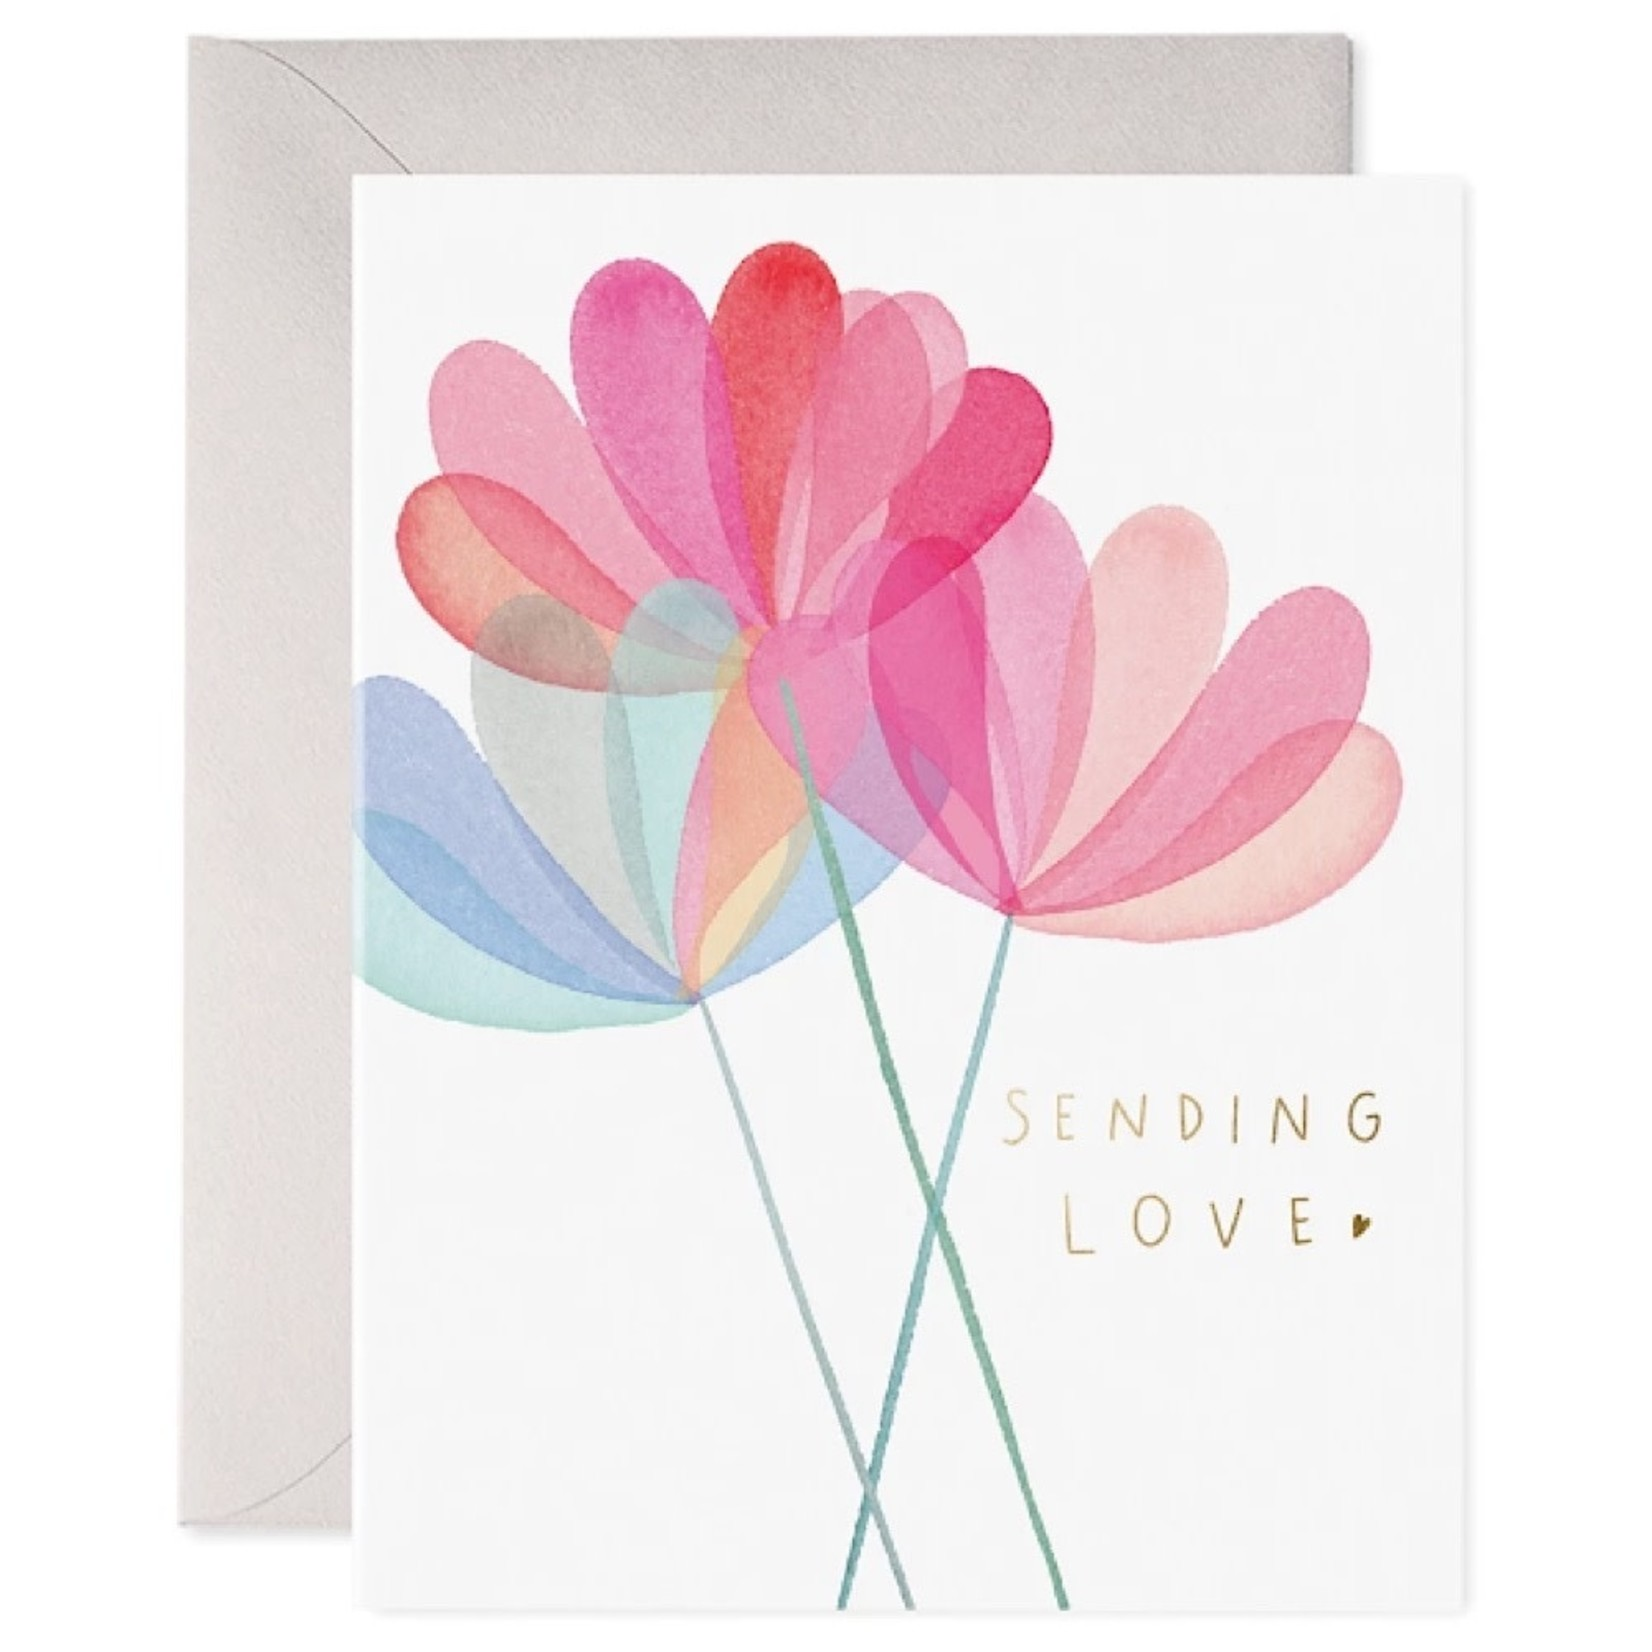 Love/Friend Card: Sending Love